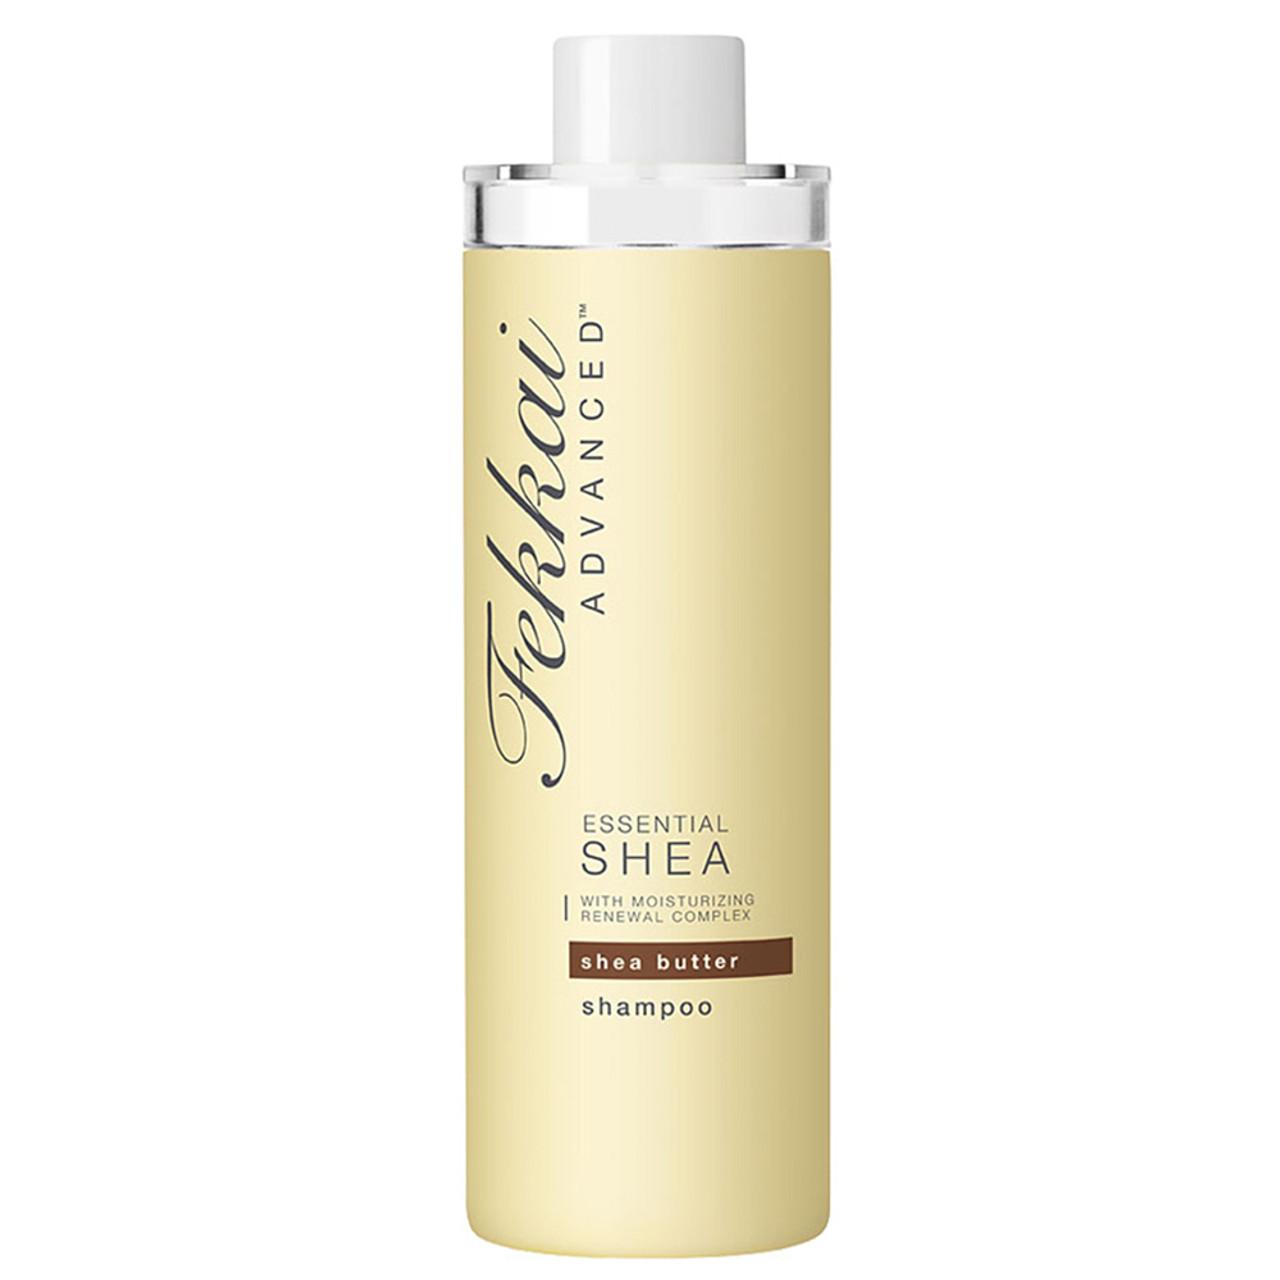 Fekkai Essential Shea Shampoo